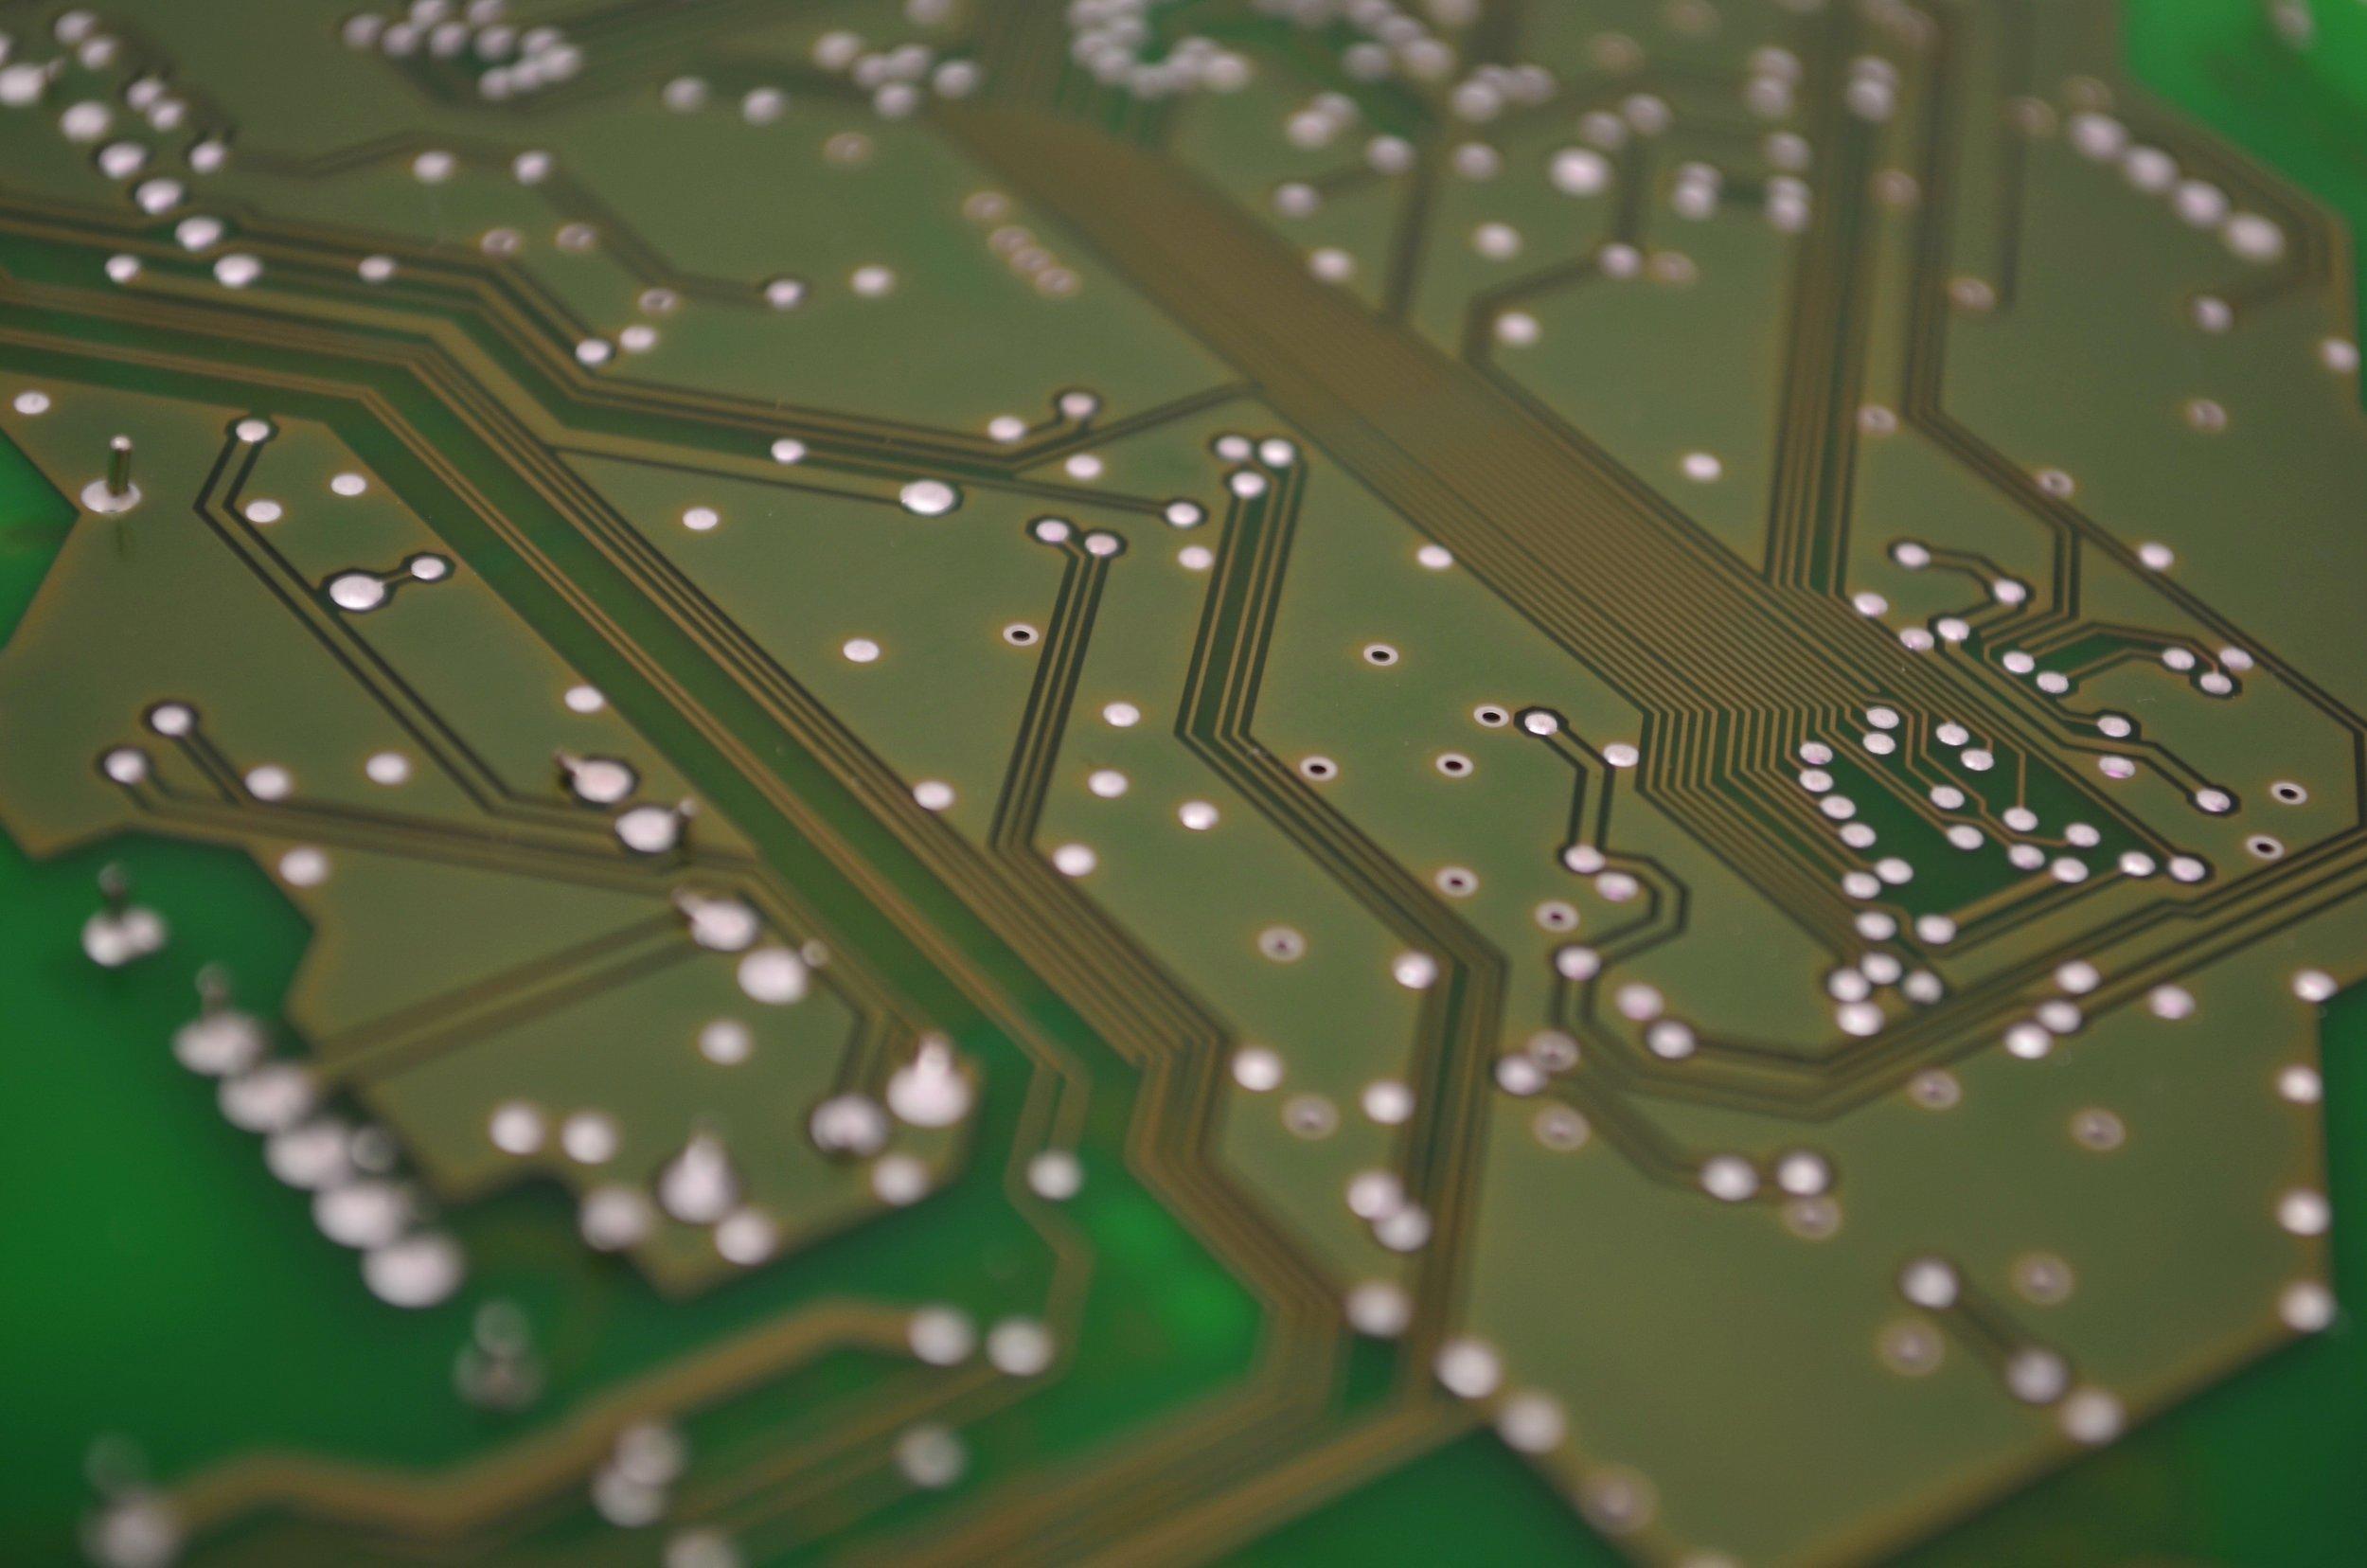 ai-artificial-intelligence-board-326461.jpg